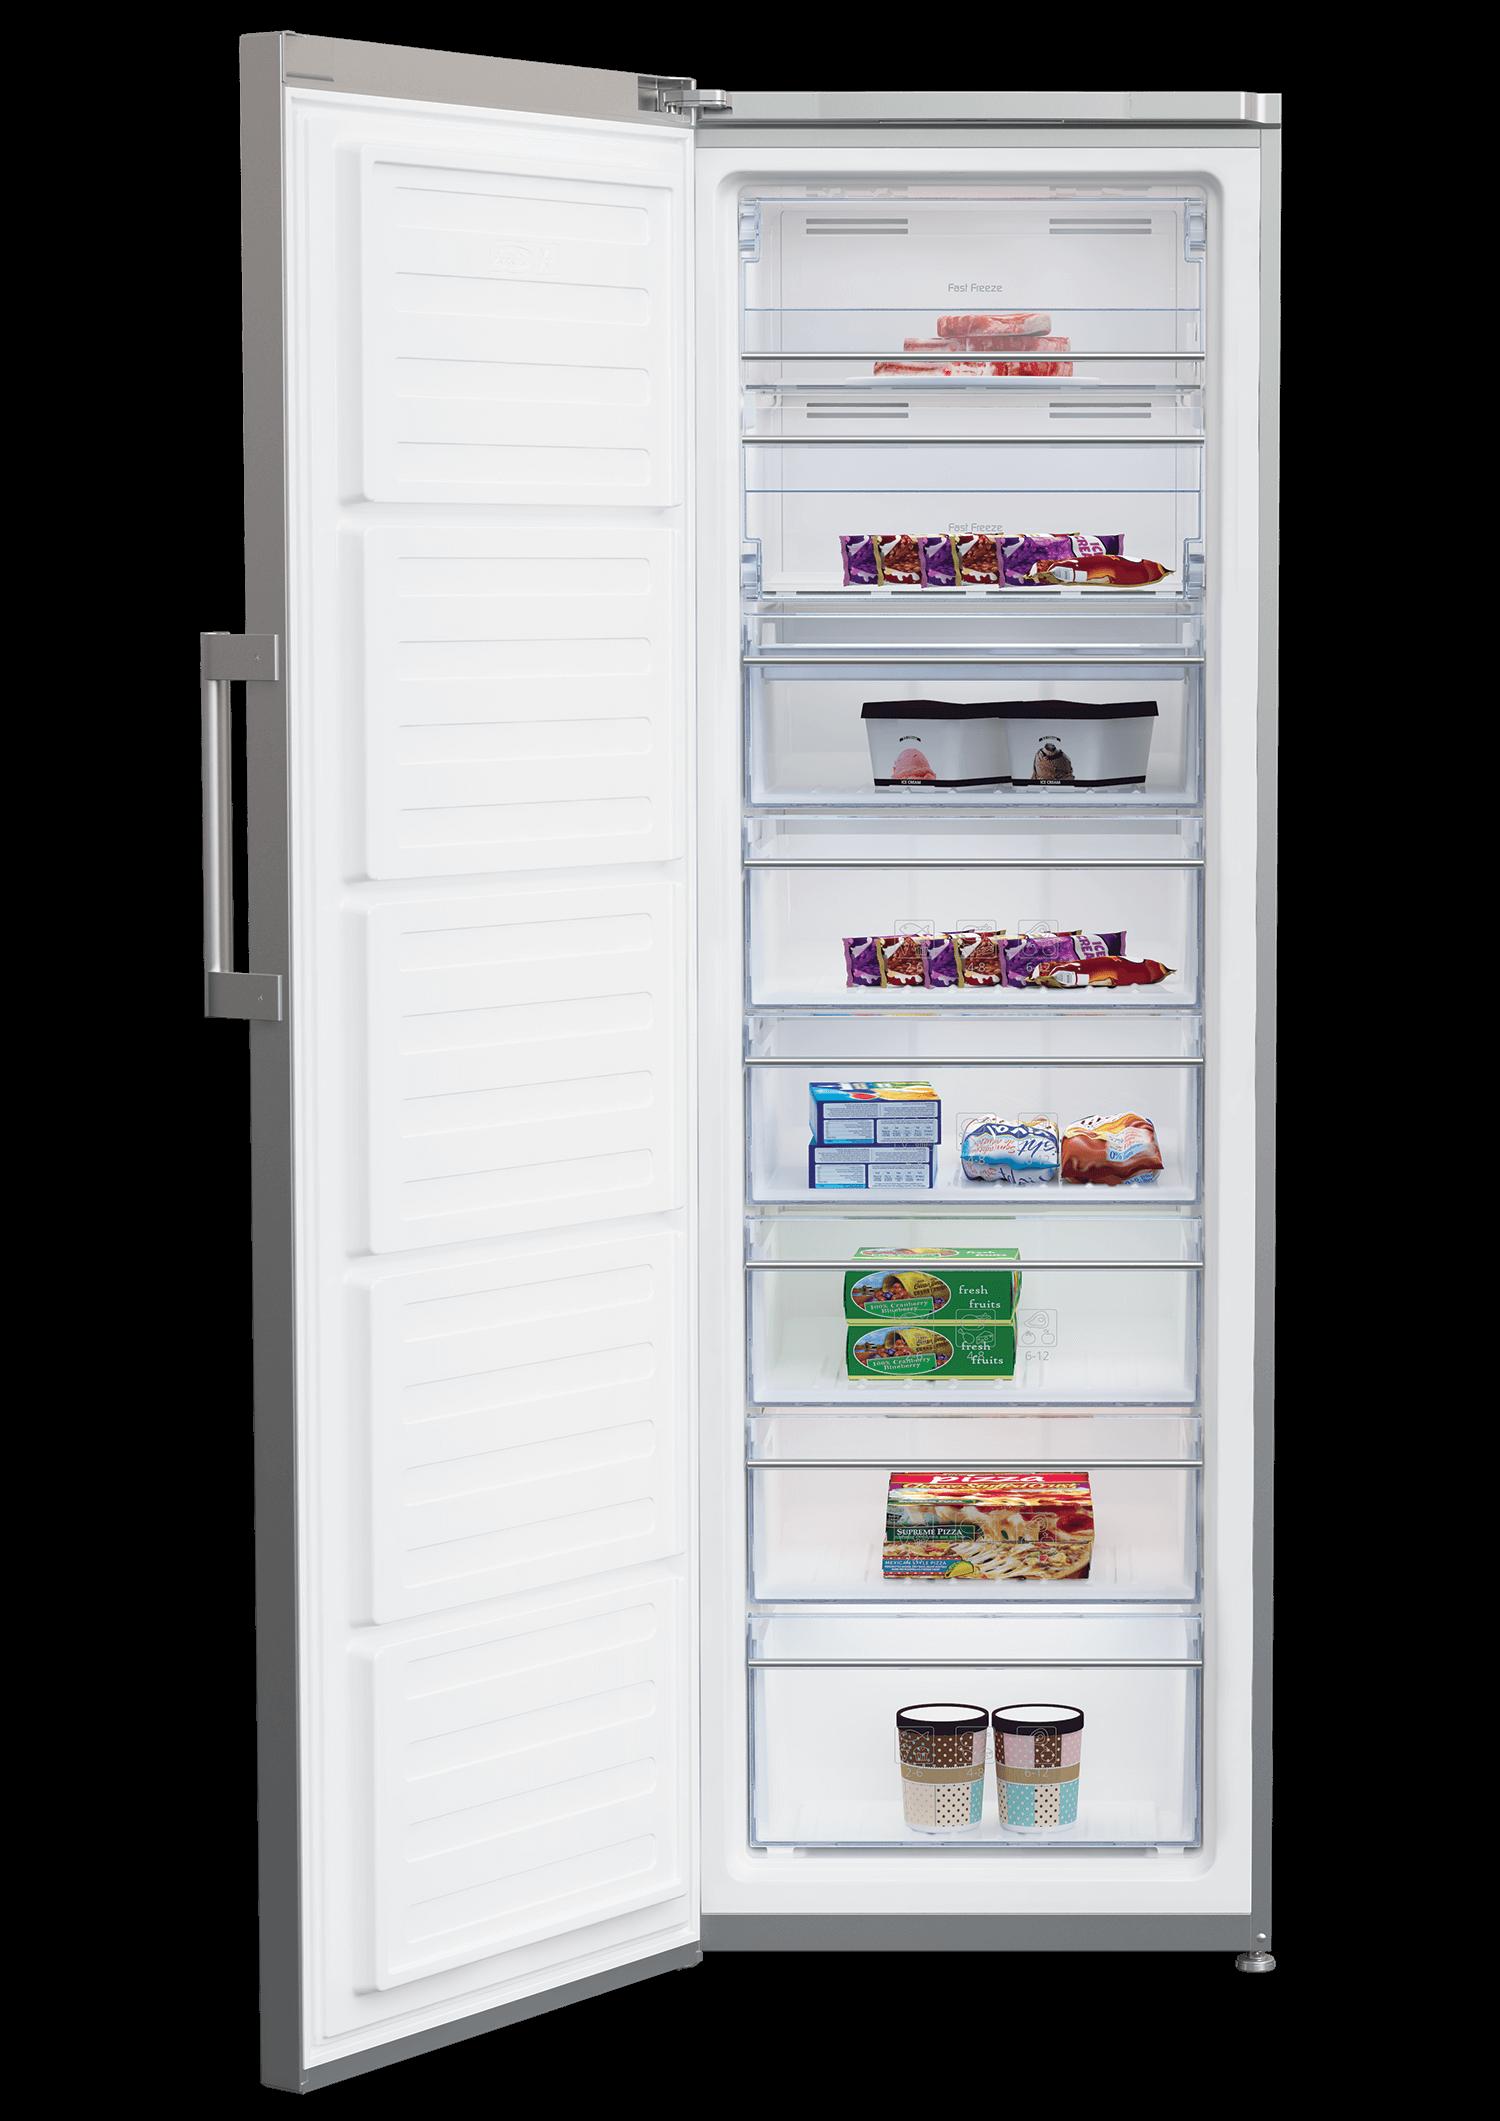 BEKO 350 Liter Upright Freezer RFNE350E23PX